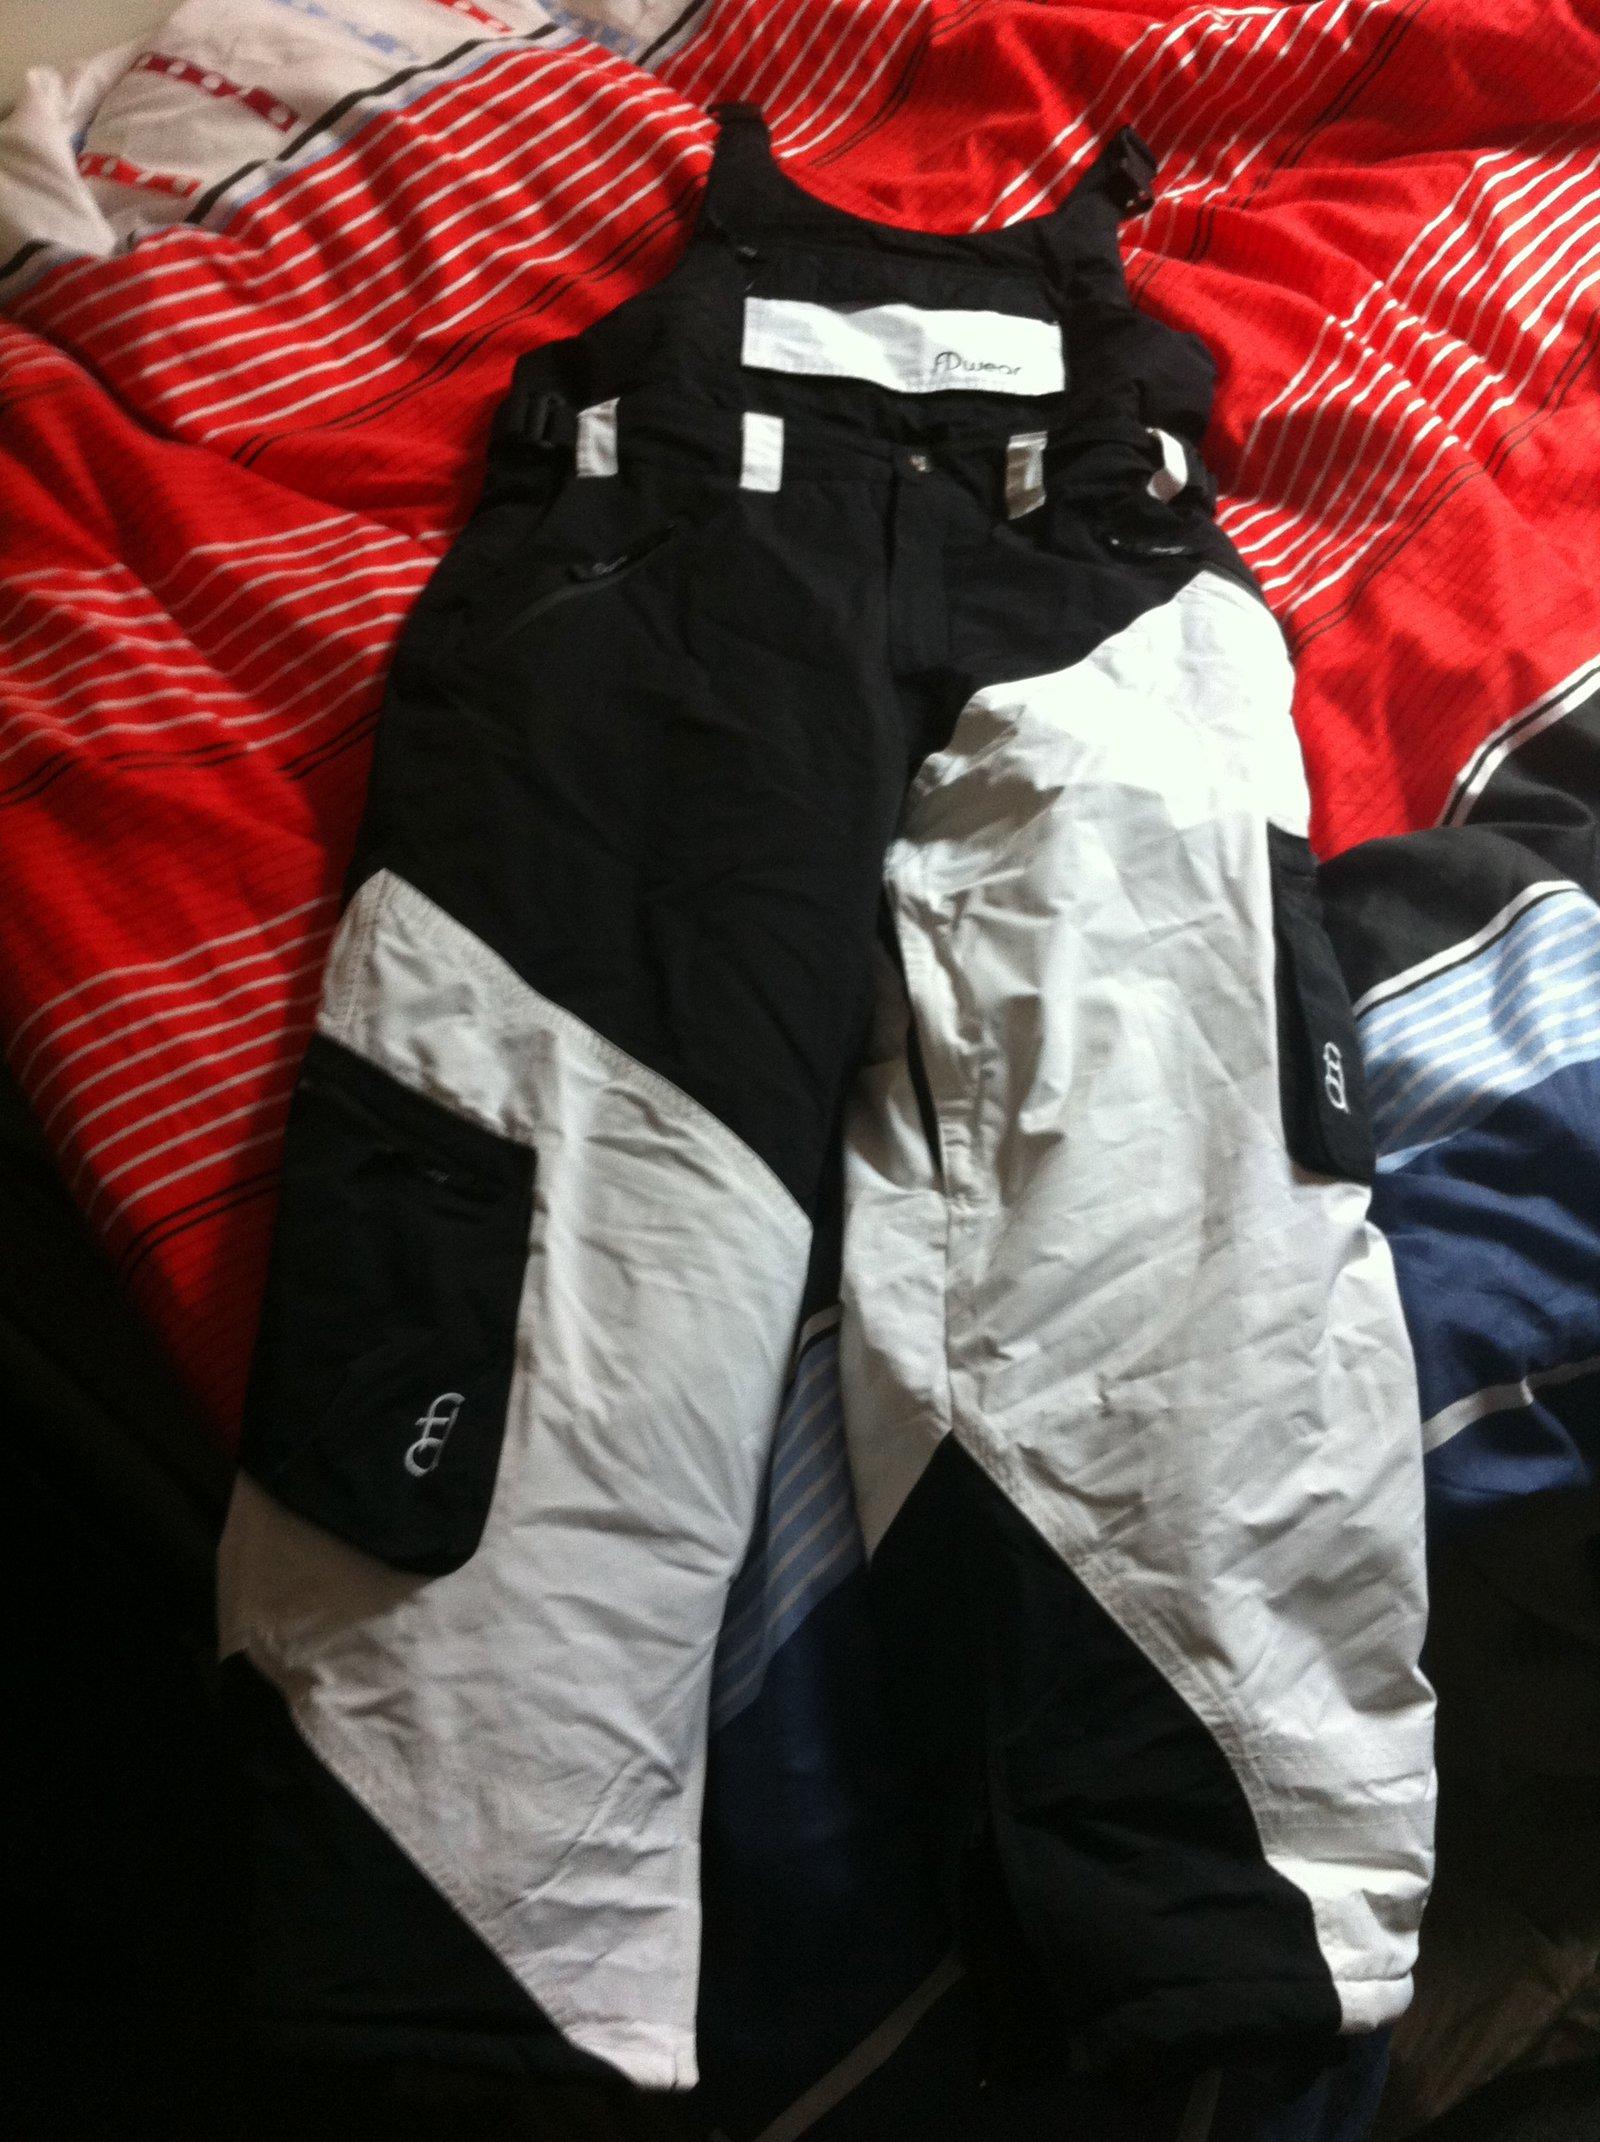 FD Pants